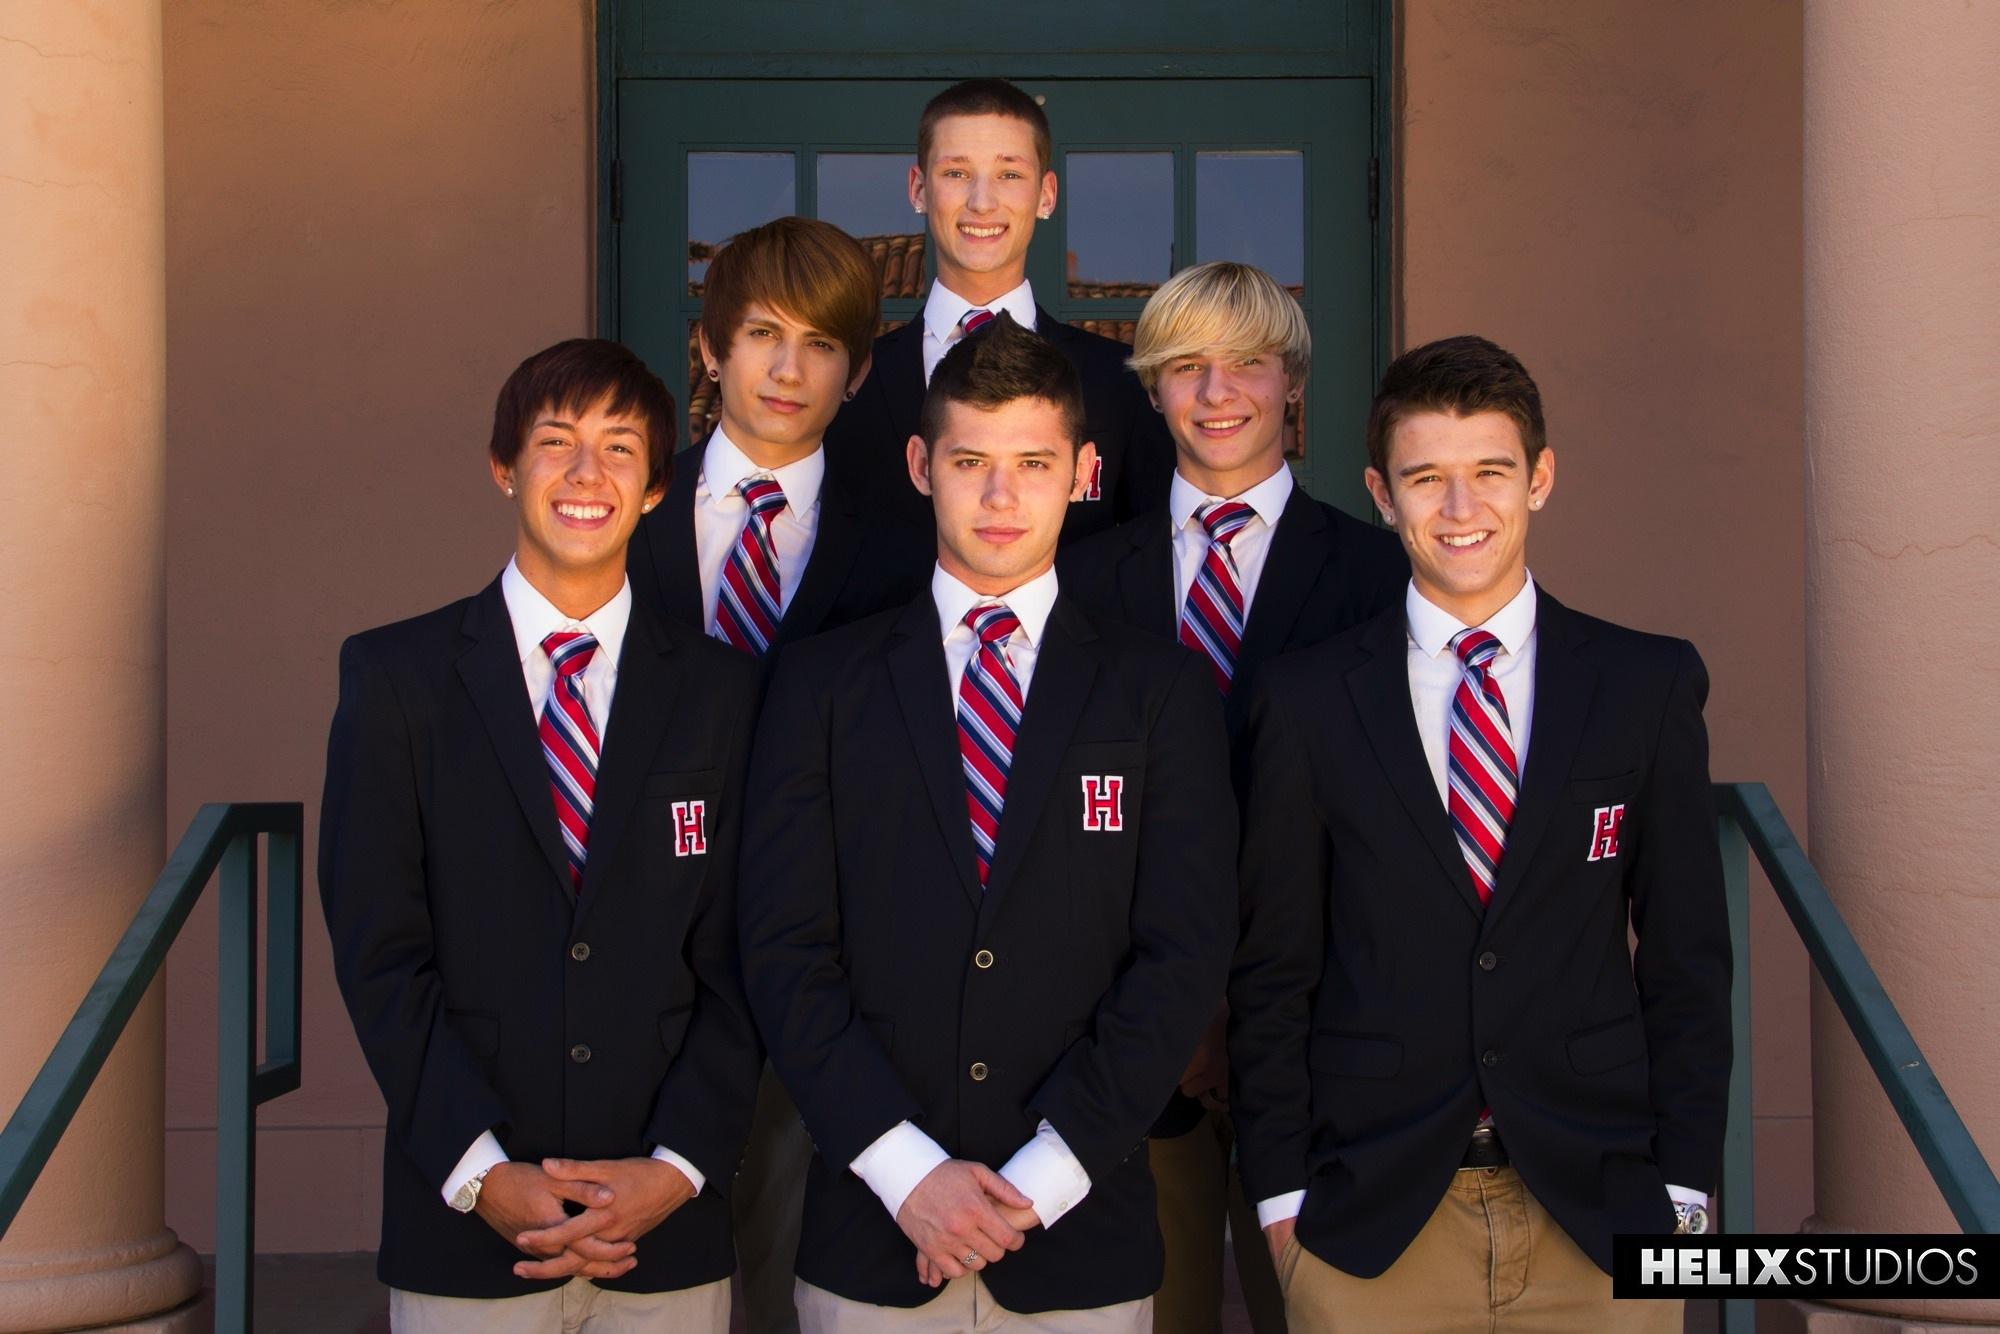 The boys of Helix Academy